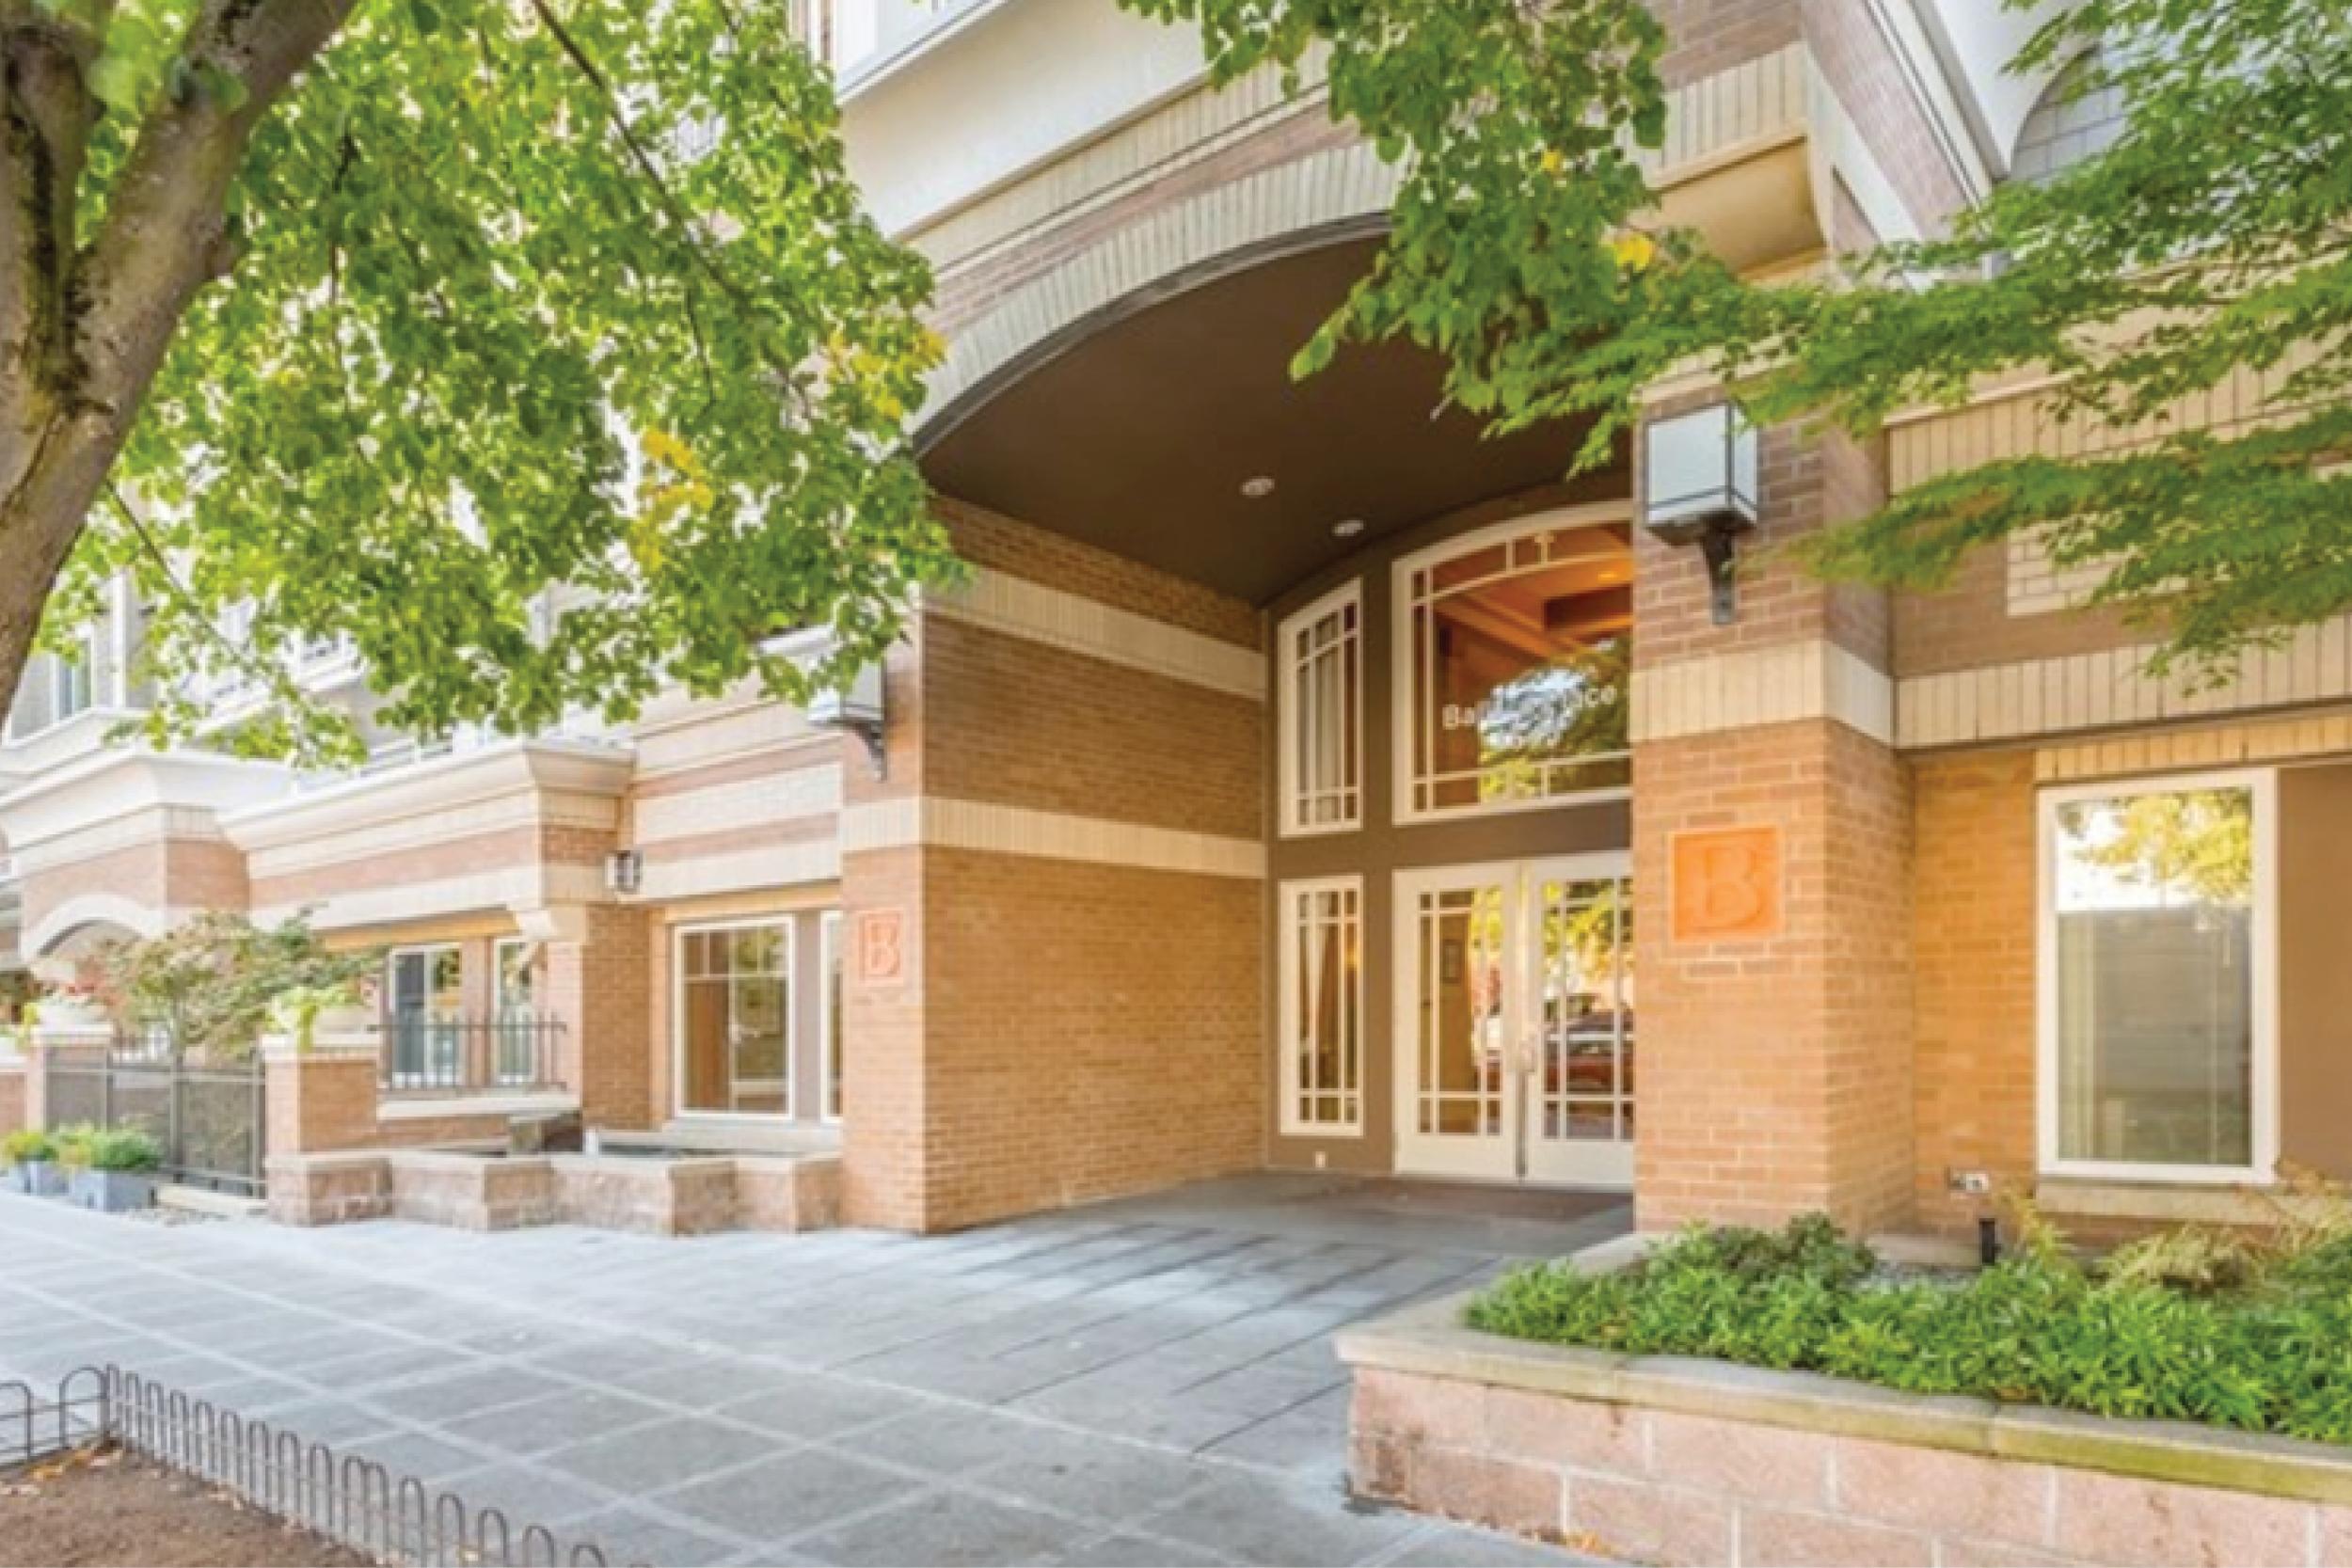 Ballard    Sold for $625,000 May 2017